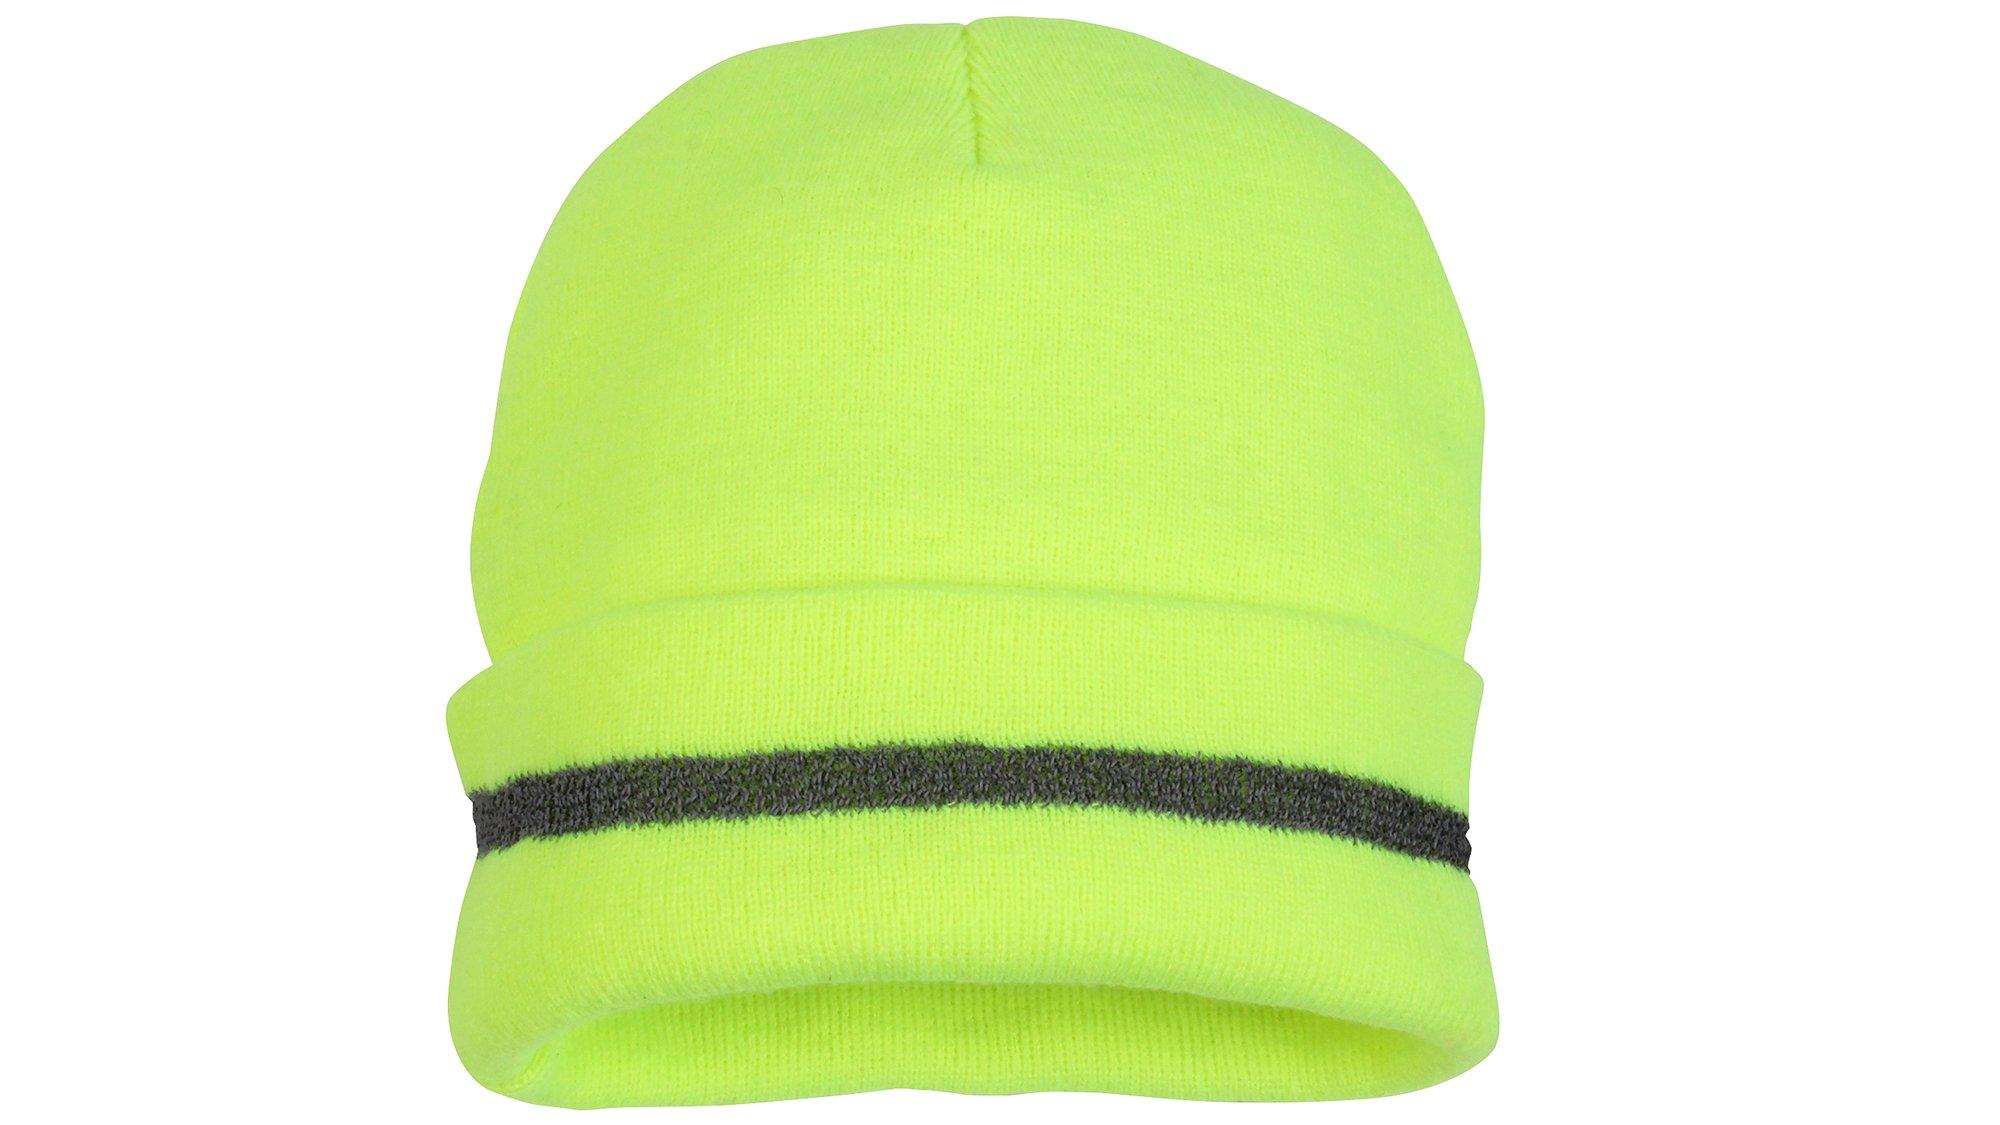 Pyramex RH110 Hi-Vis Reflective Lime Knit Cap, (12 Each)